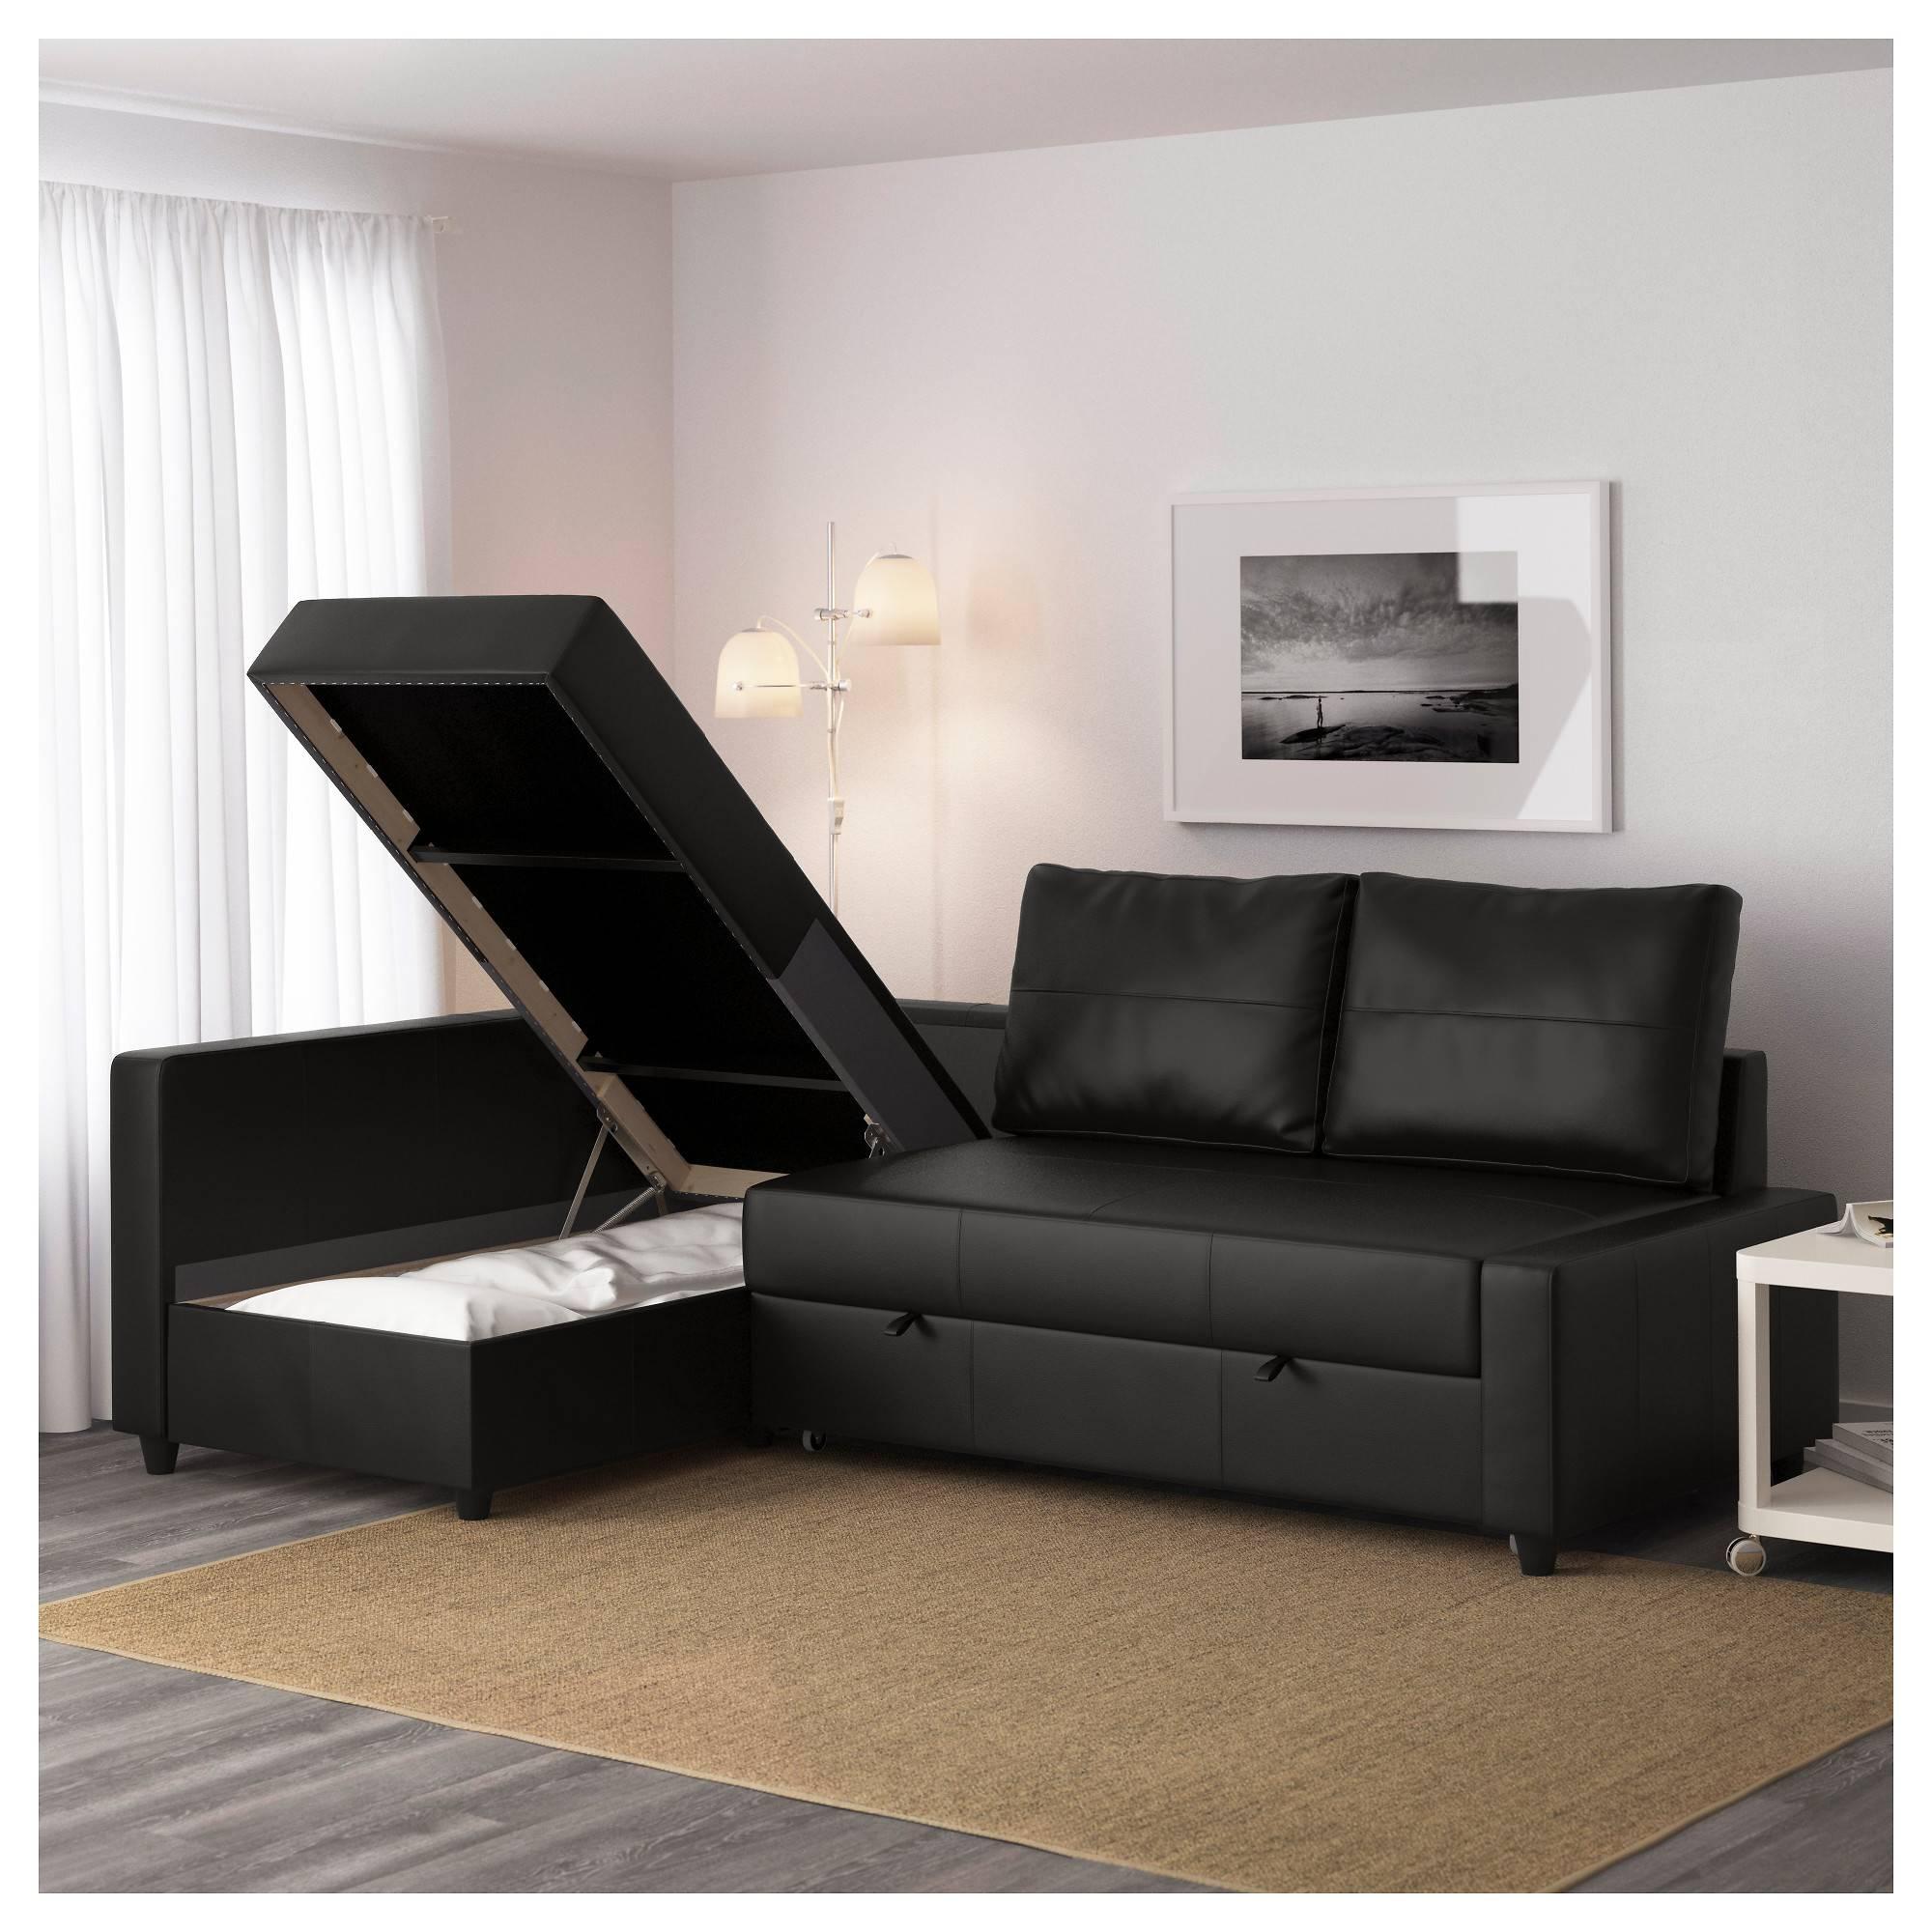 Friheten Sleeper Sectional,3 Seat W/storage - Skiftebo Dark Gray with Storage Sofas Ikea (Image 13 of 25)